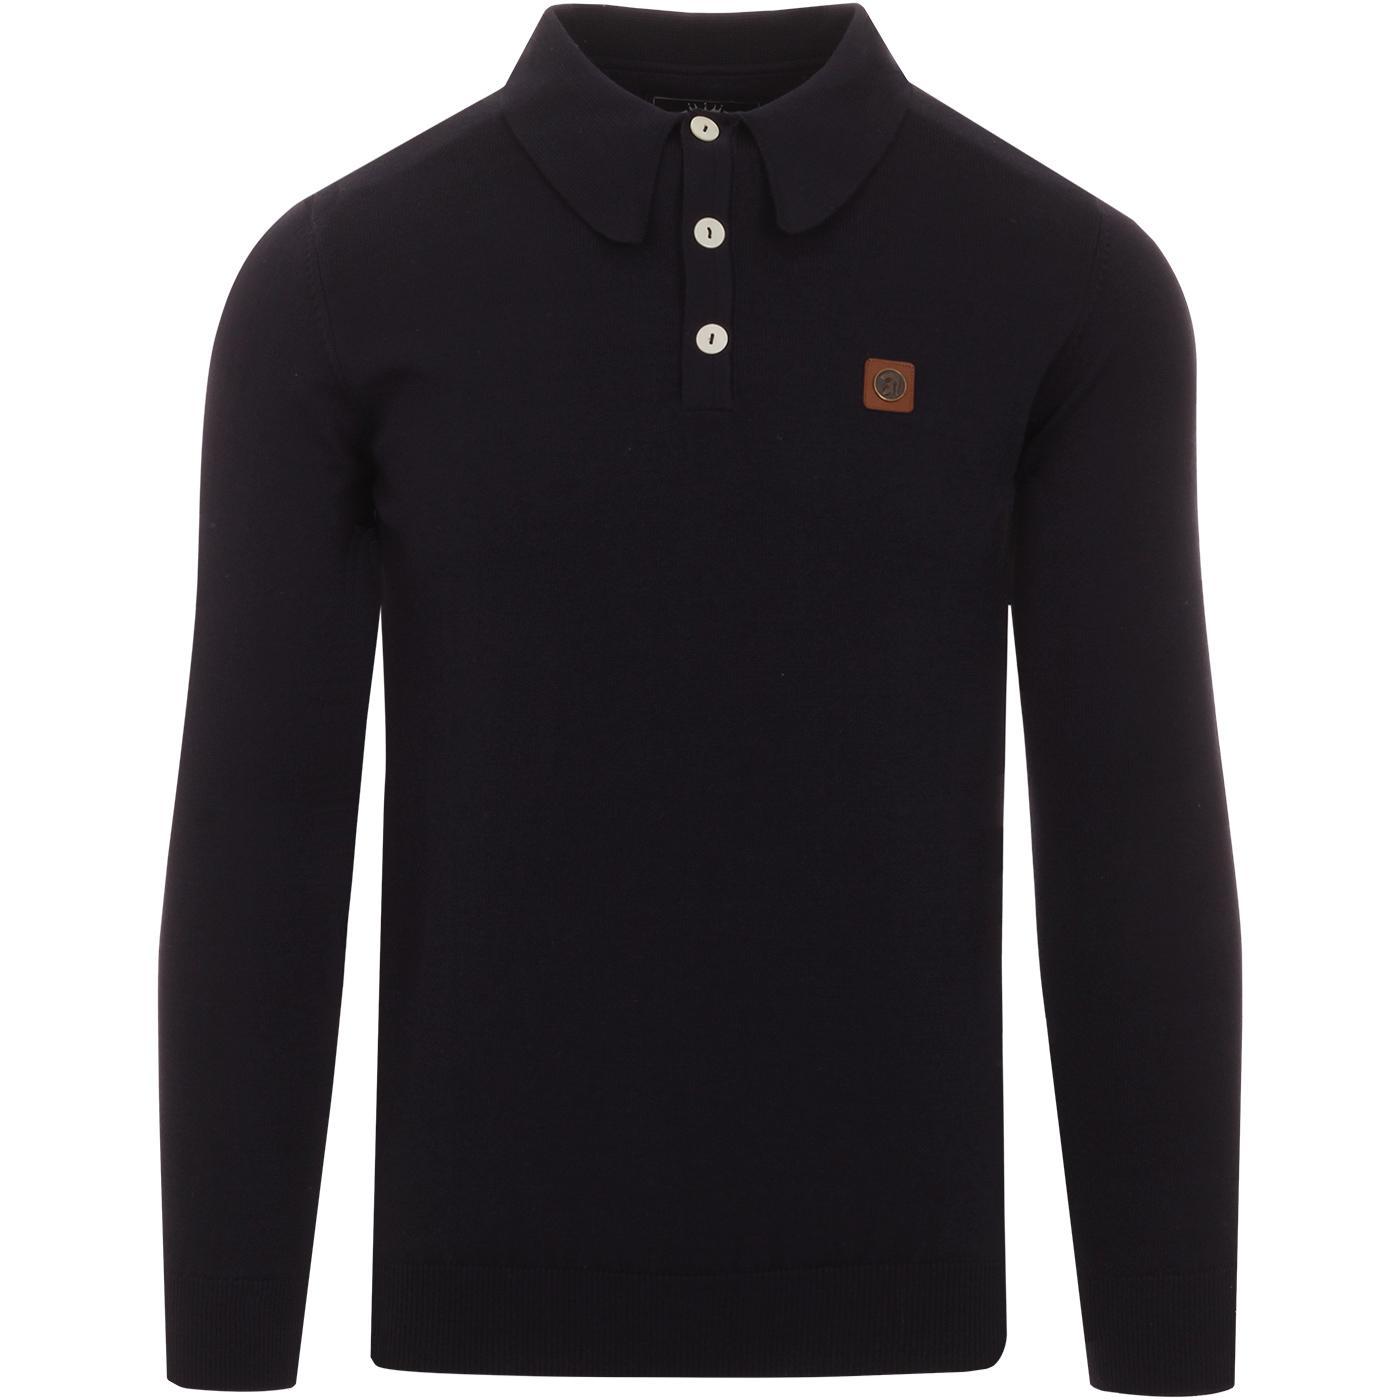 TROJAN RECORDS Men's Mod Knitted Polo Shirt (Navy)